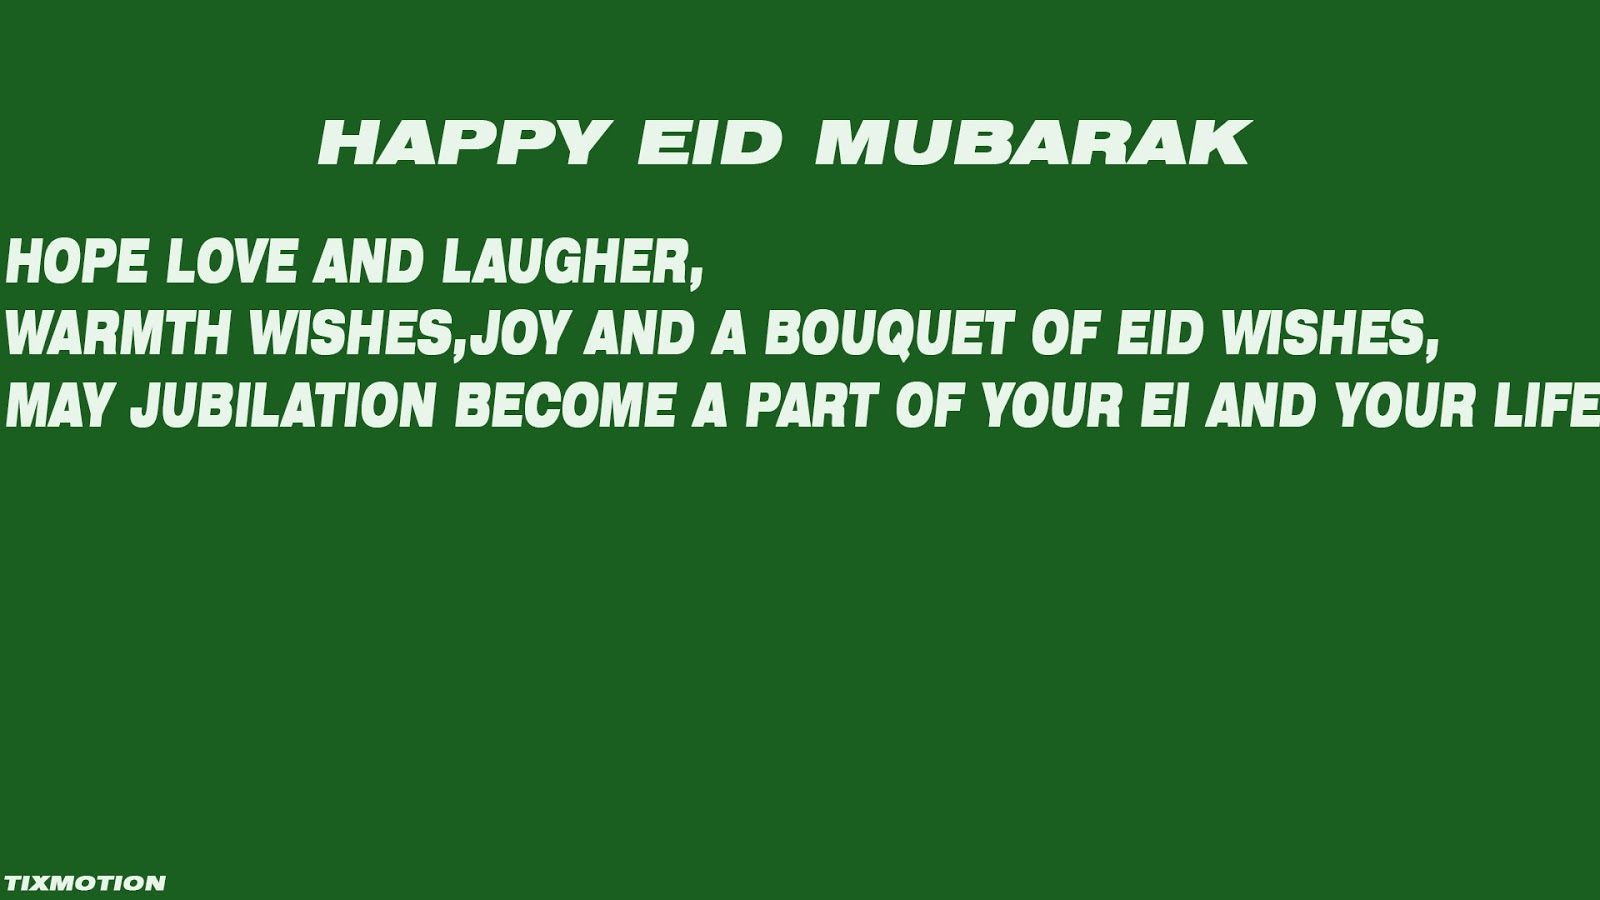 Happy Eid Mubarak 2016 Hd Wallpaper Free Download And